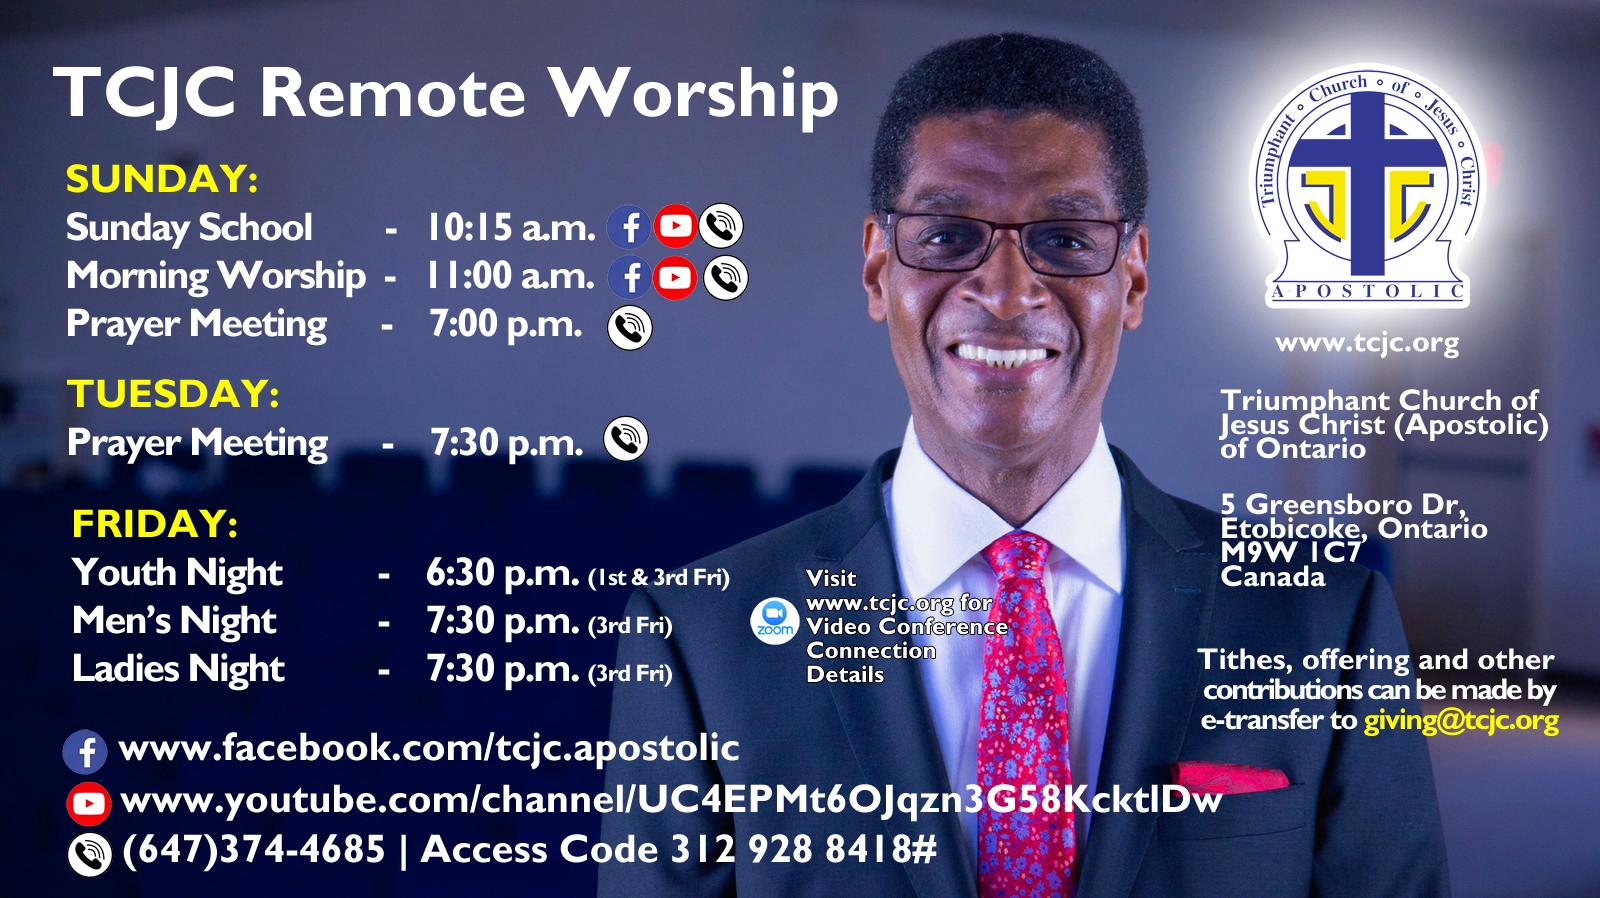 TCJC_Remote_Worship_Info_2